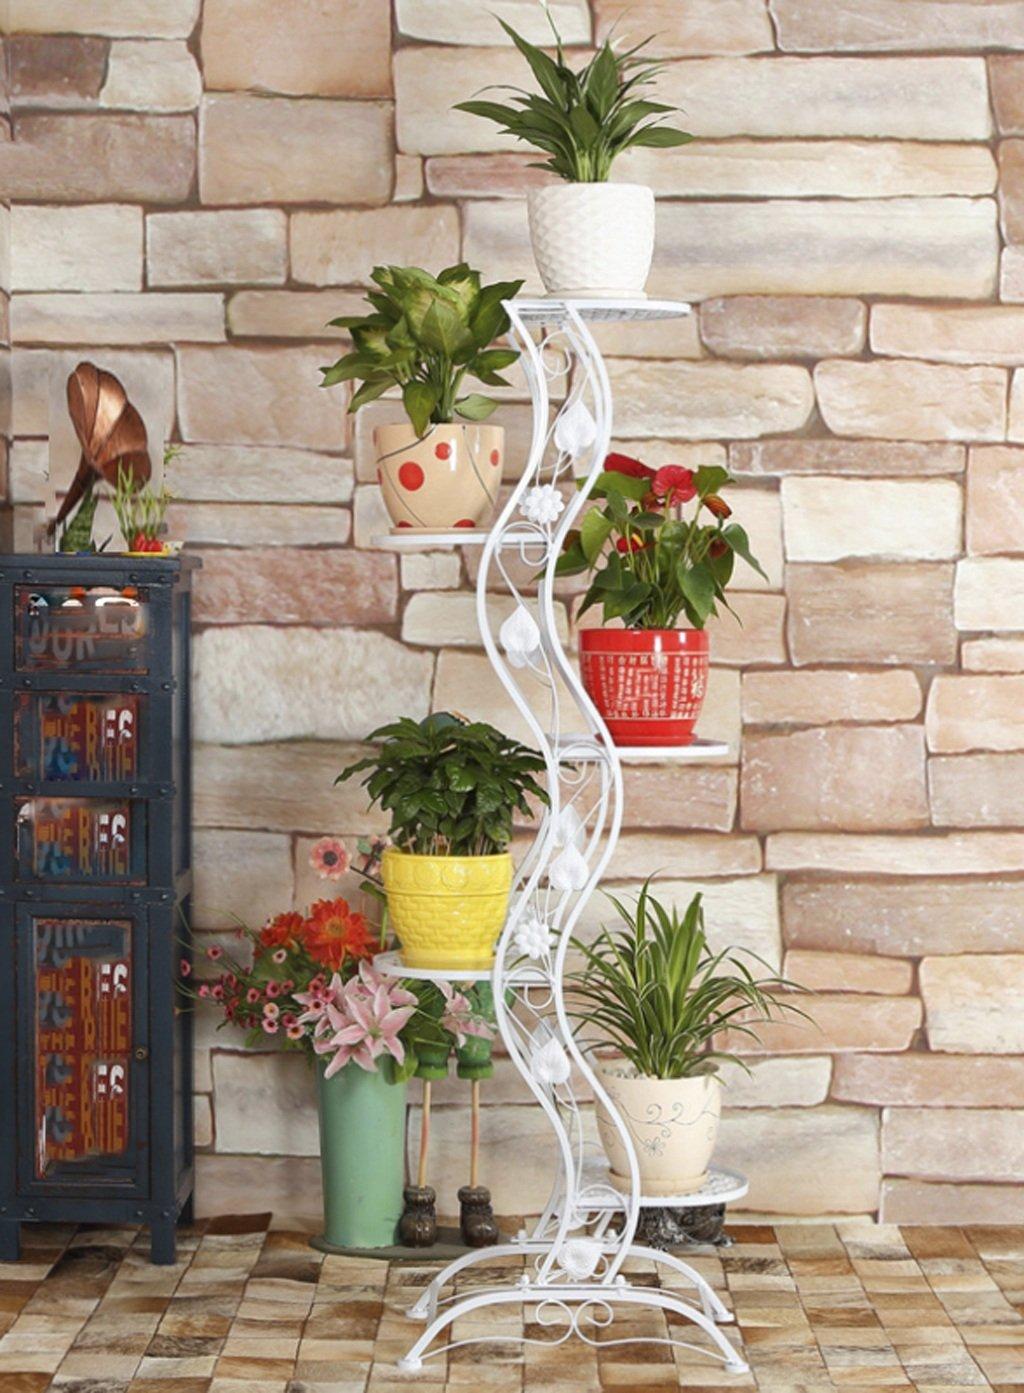 LB huajia ZHANWEI Pastoral-Eisen-Blumen-Zahnstange-Fußboden-mehrgeschossige Regale europäischer Art hochwertiger Bonsais-Rahmen-Balkon Flowerpot-Wand der Eisen-Blumen-Regale (größe : A-138cm)